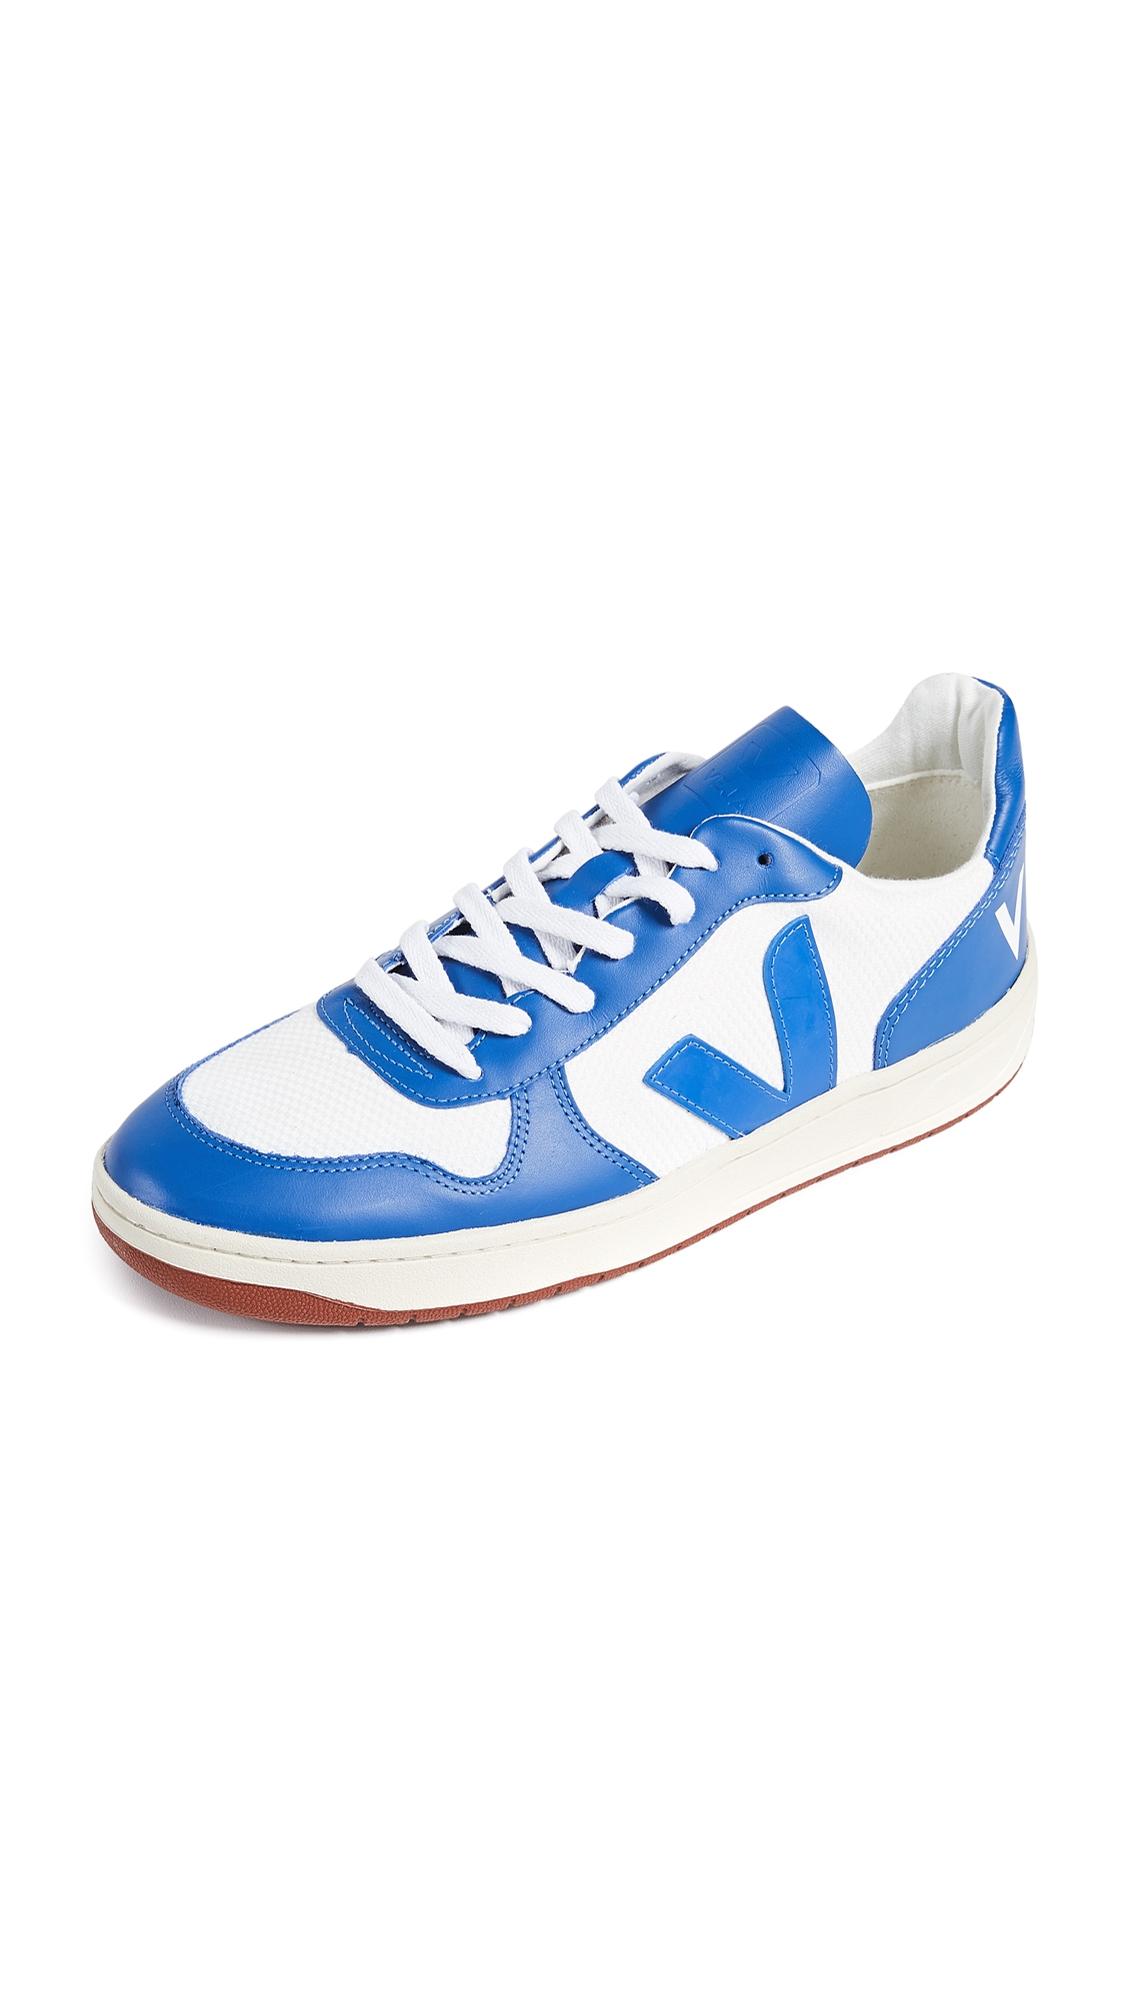 VEJA V10 Bastille Mesh Sneakers In Blue